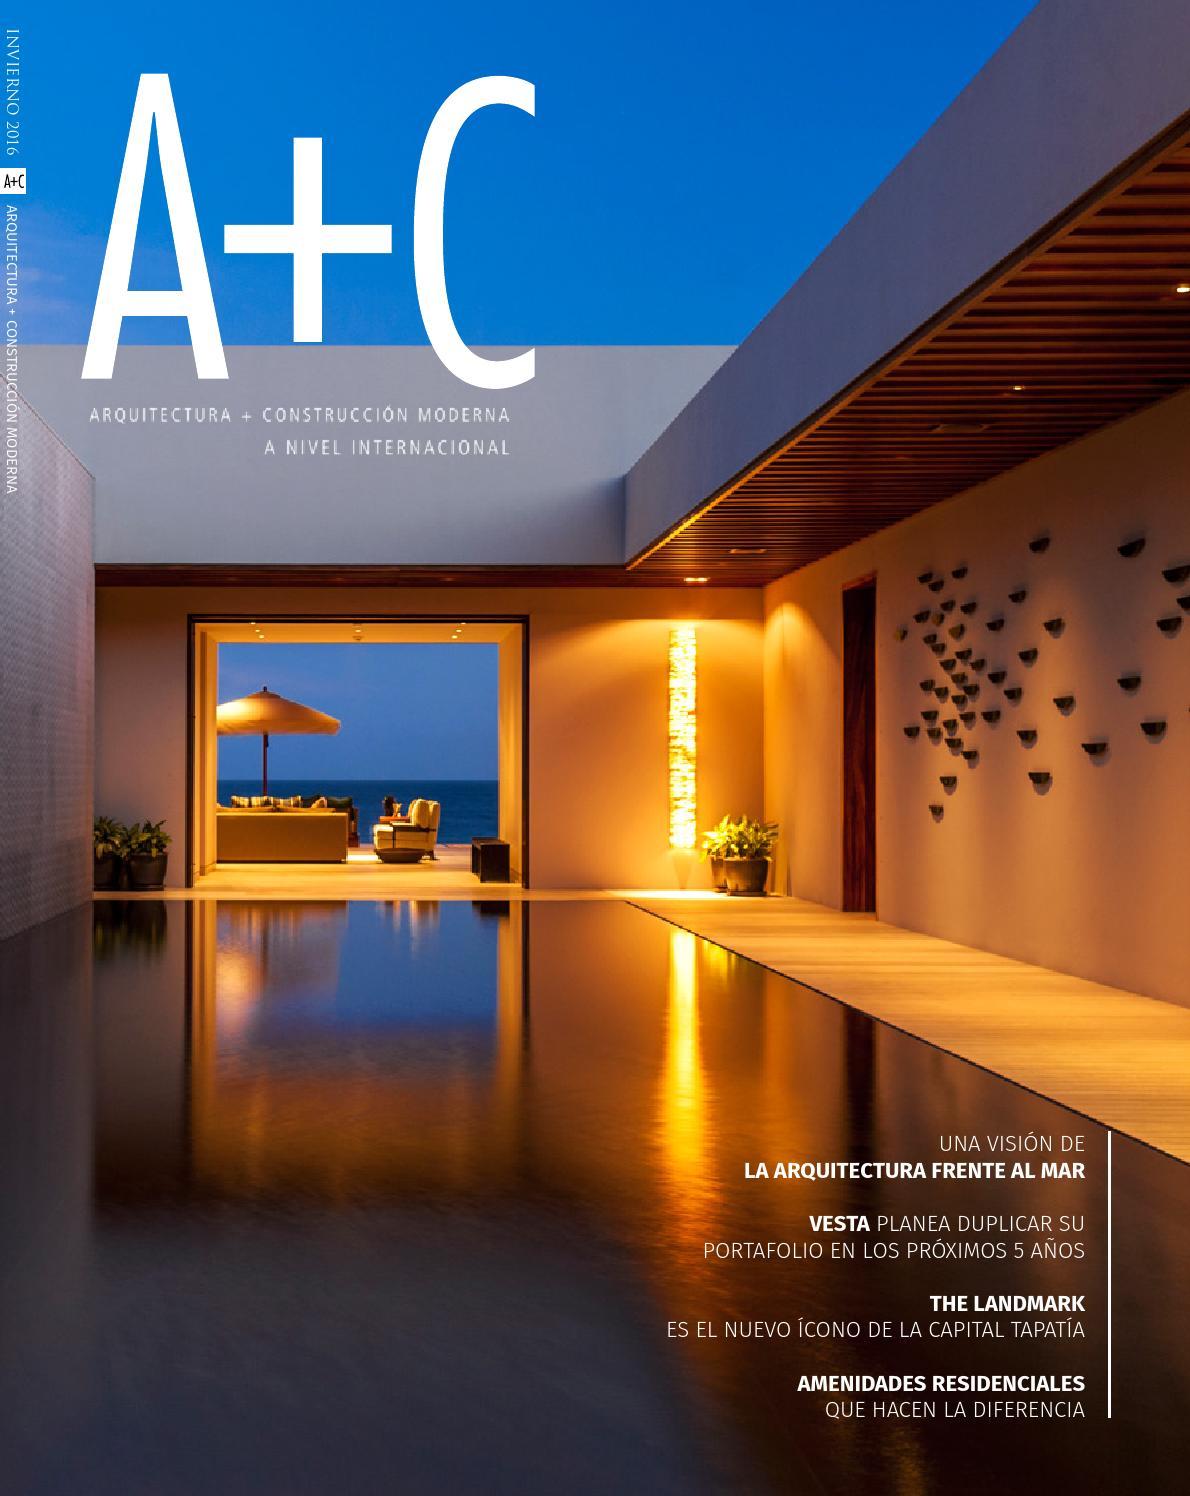 A c moderna invierno 2016 by ac moderna issuu - Amutio y bernal arquitectos ...